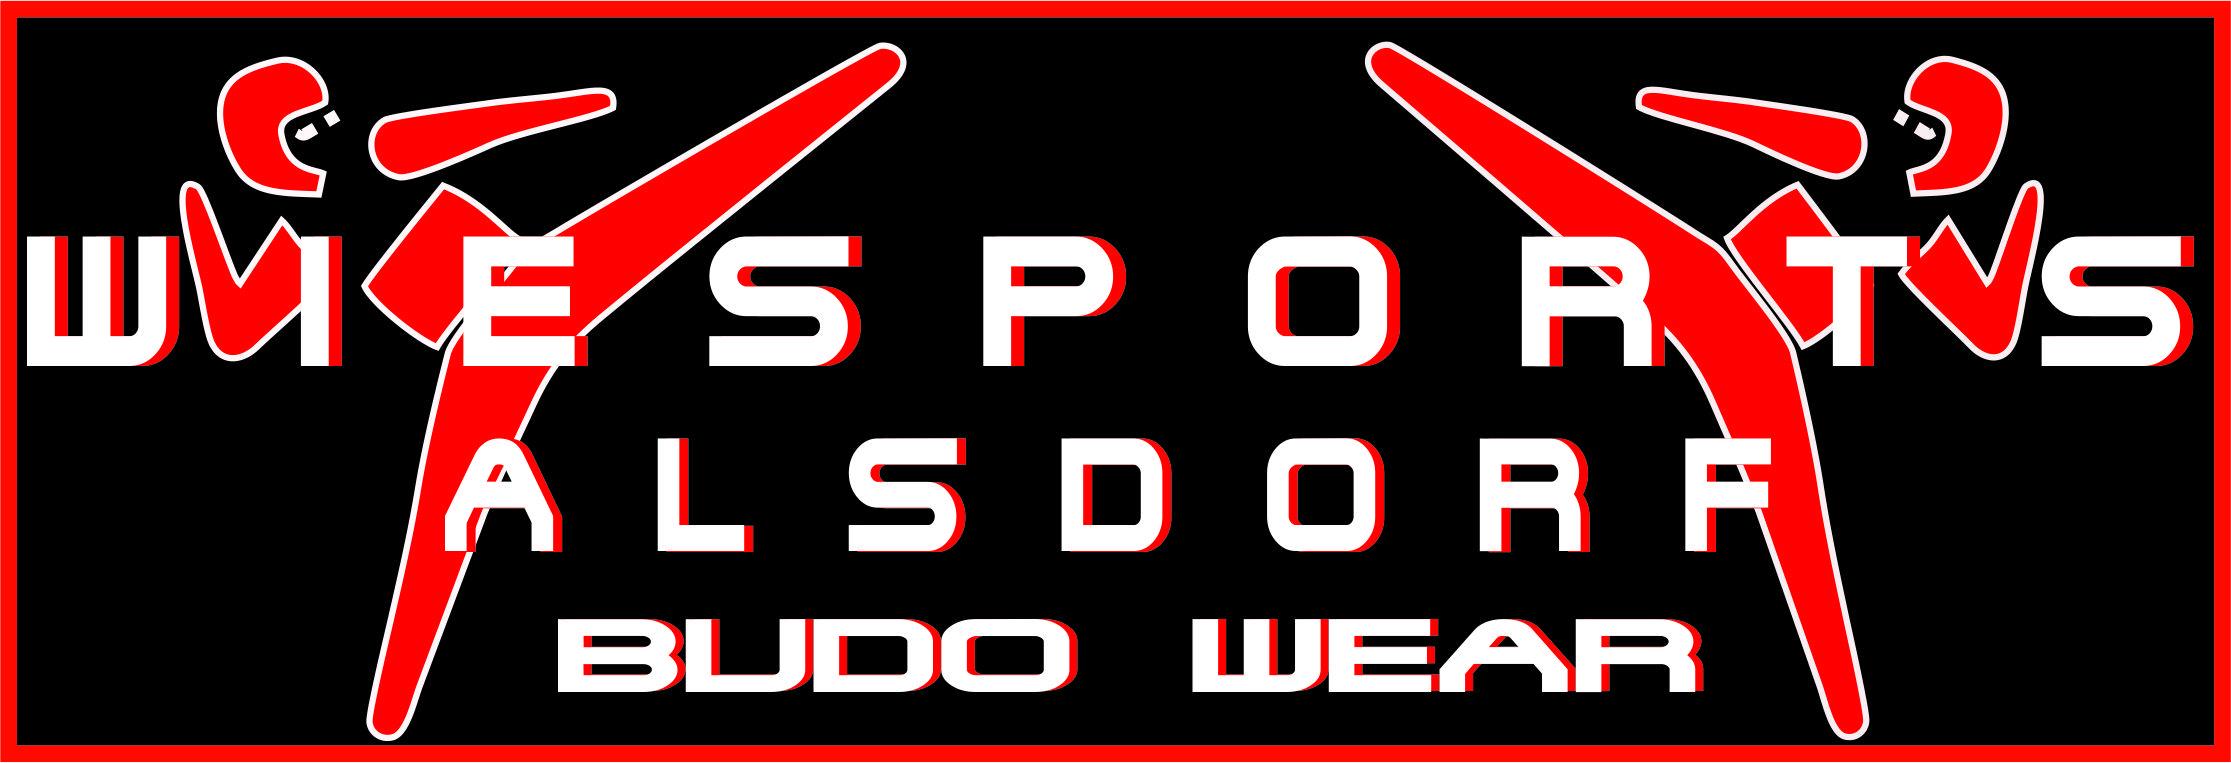 Sponsoren - WieSports Alsdorf